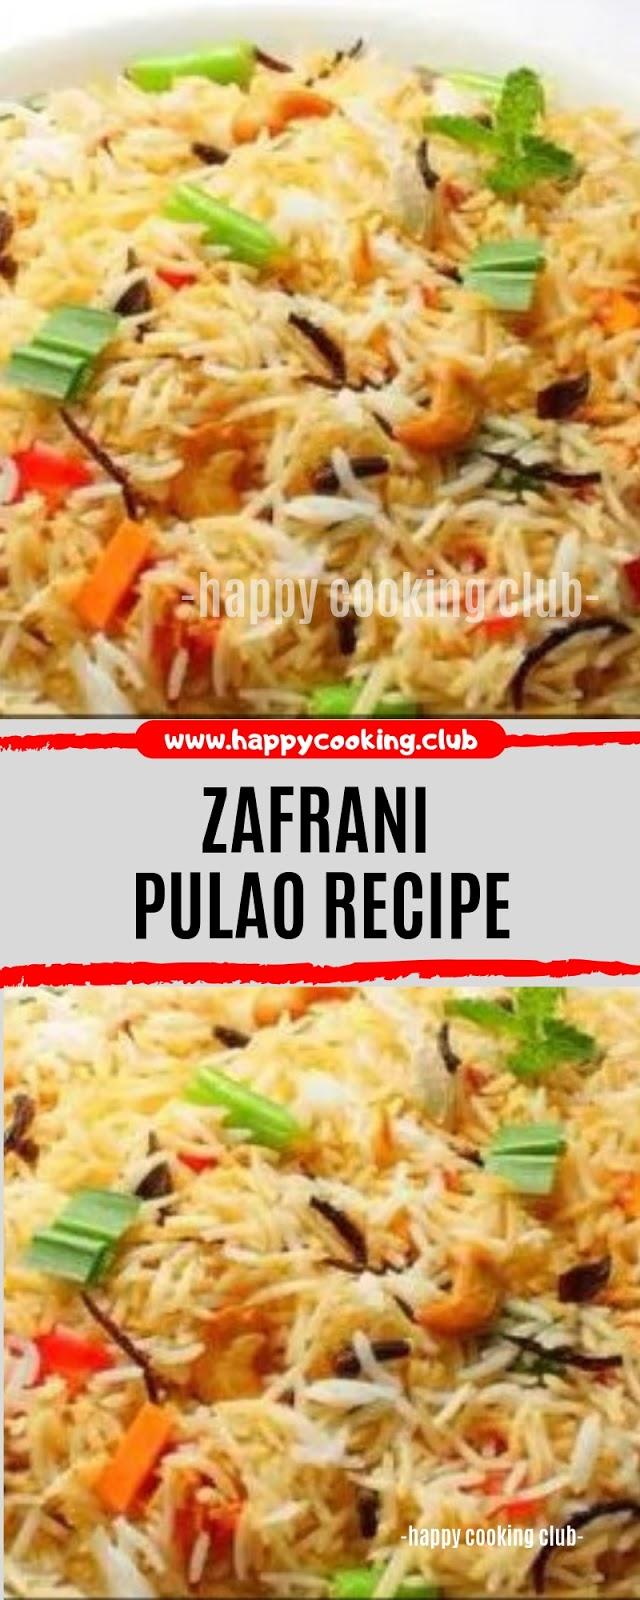 Zafrani Pulao Recipe